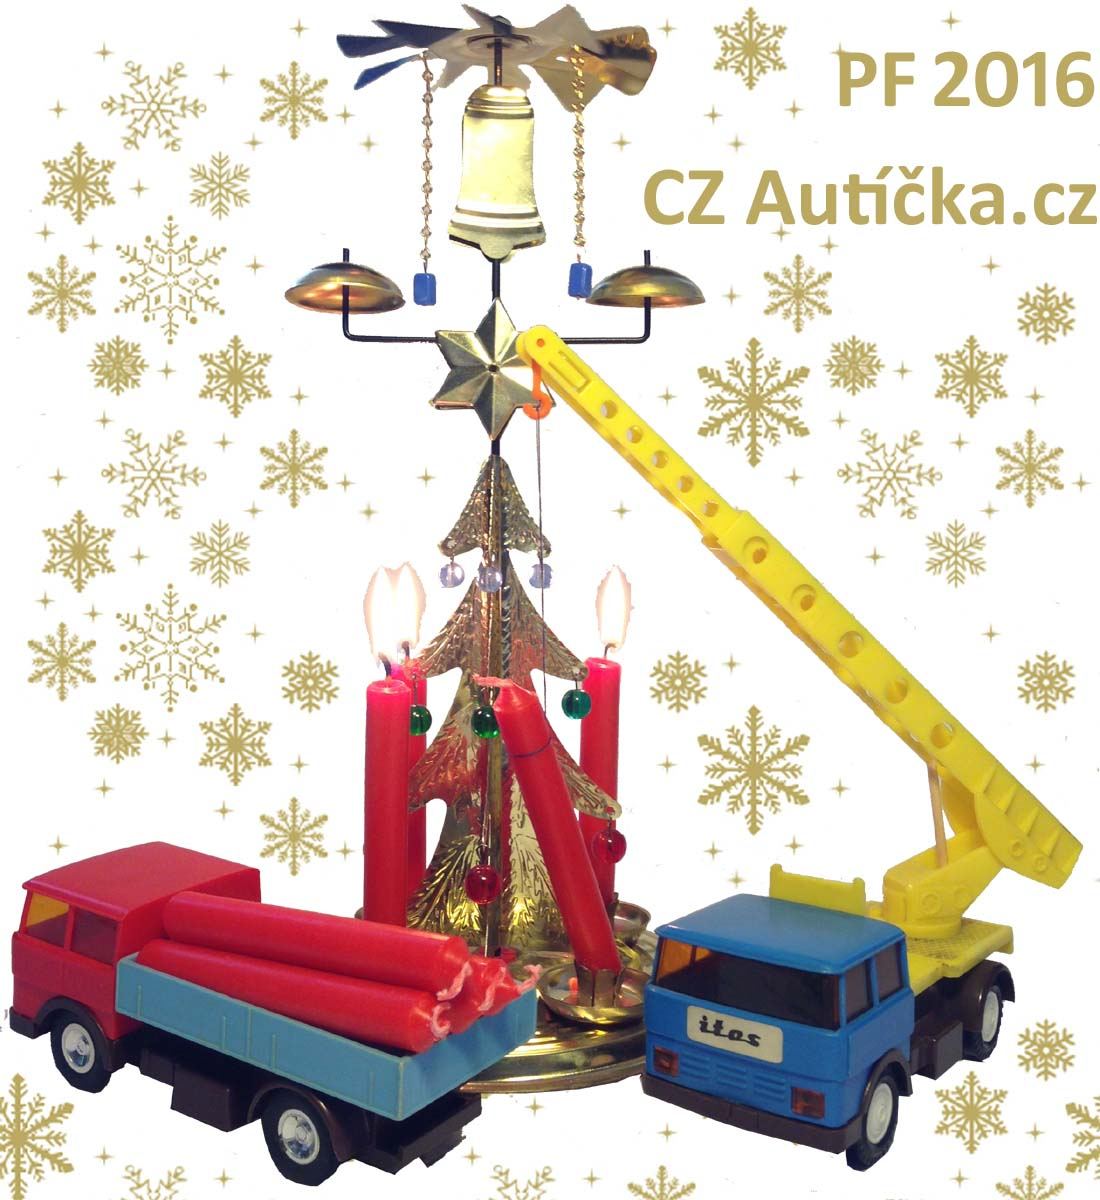 PF2016 final